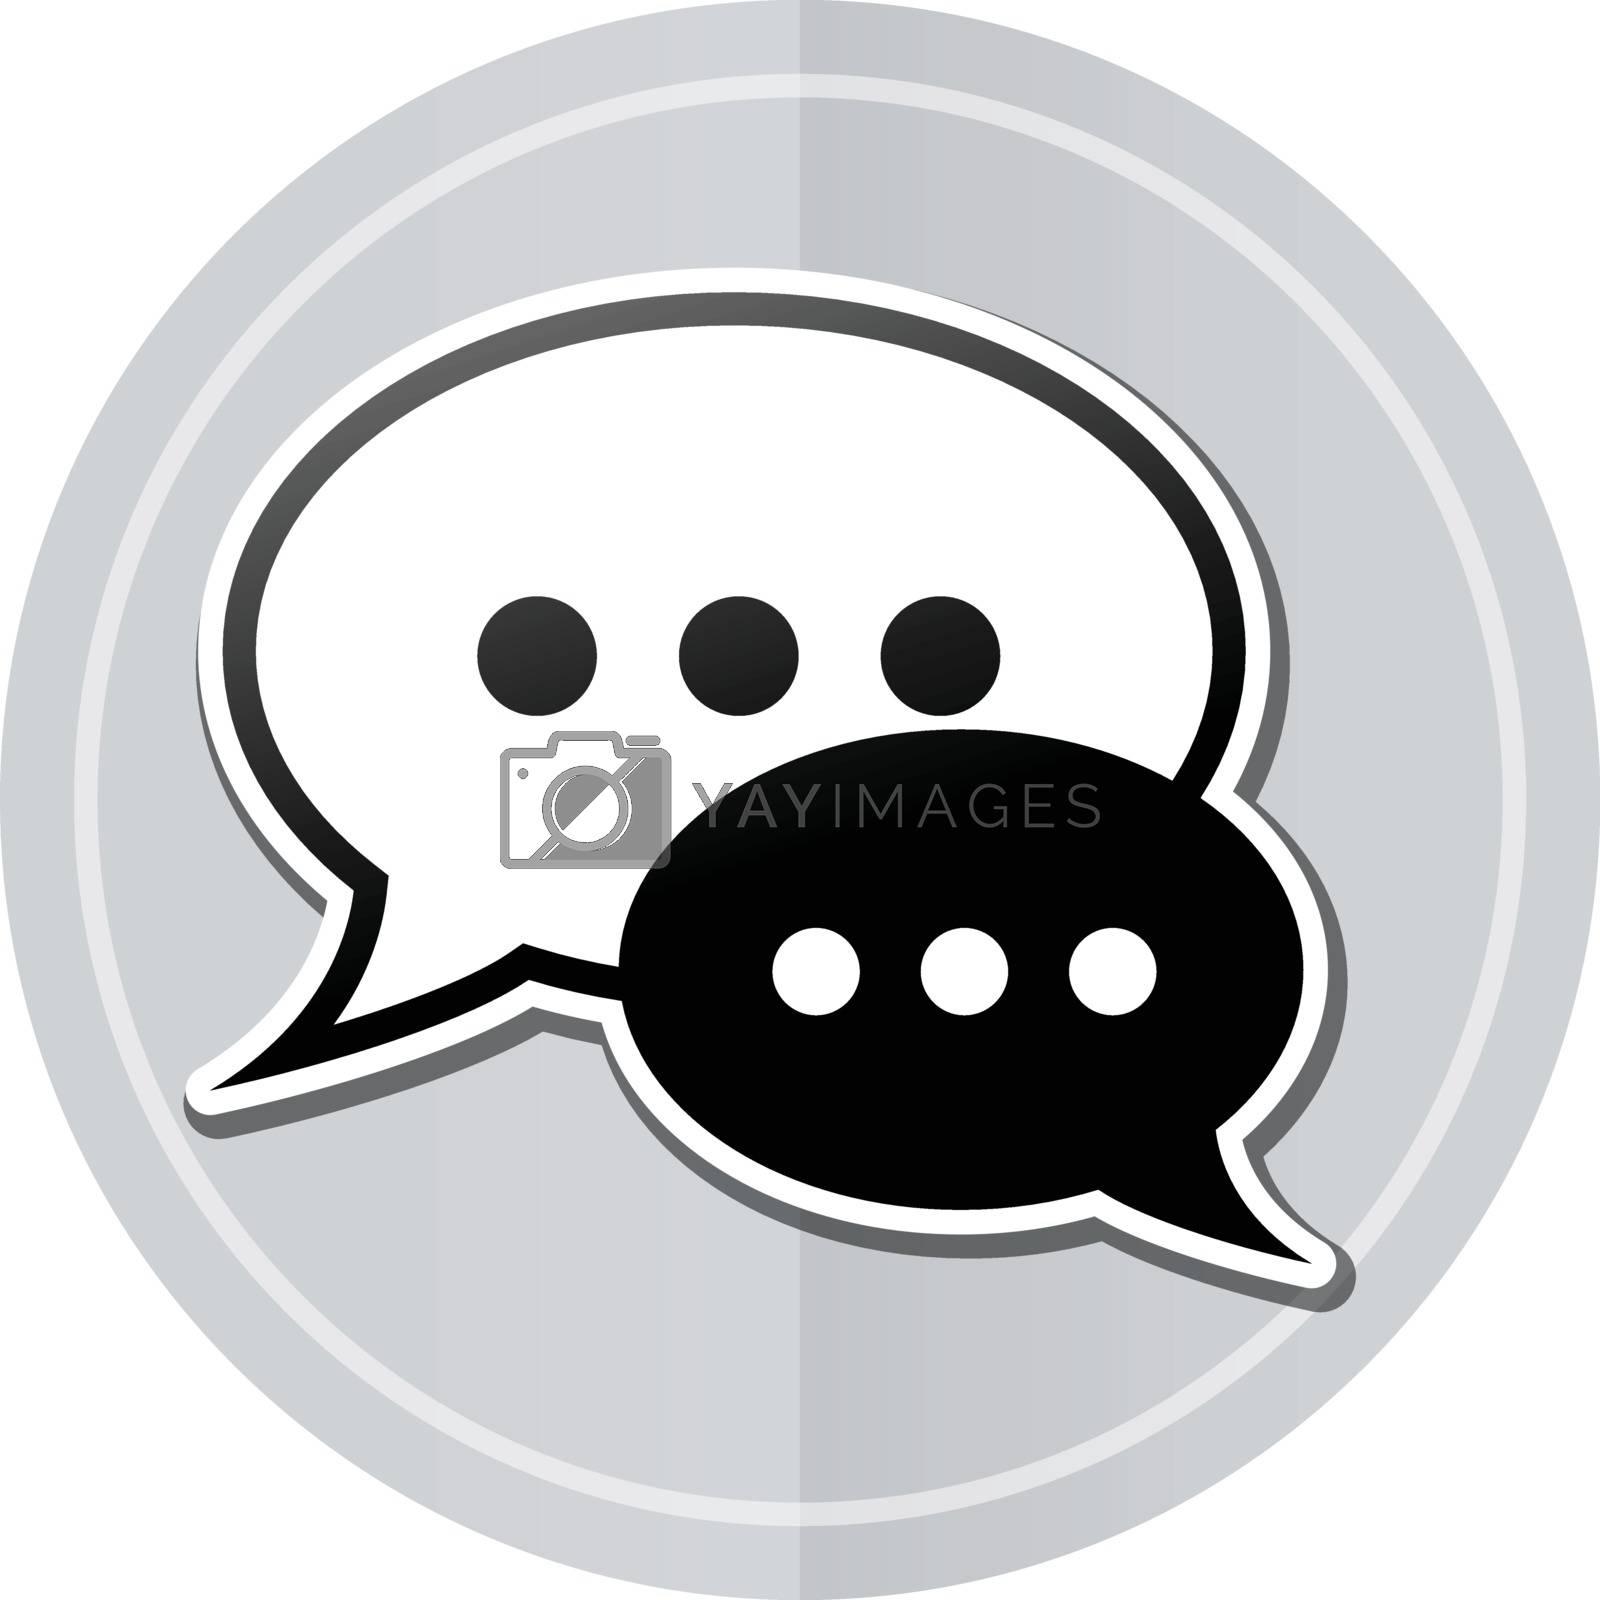 Illustration of speech bubble sticker icon simple design